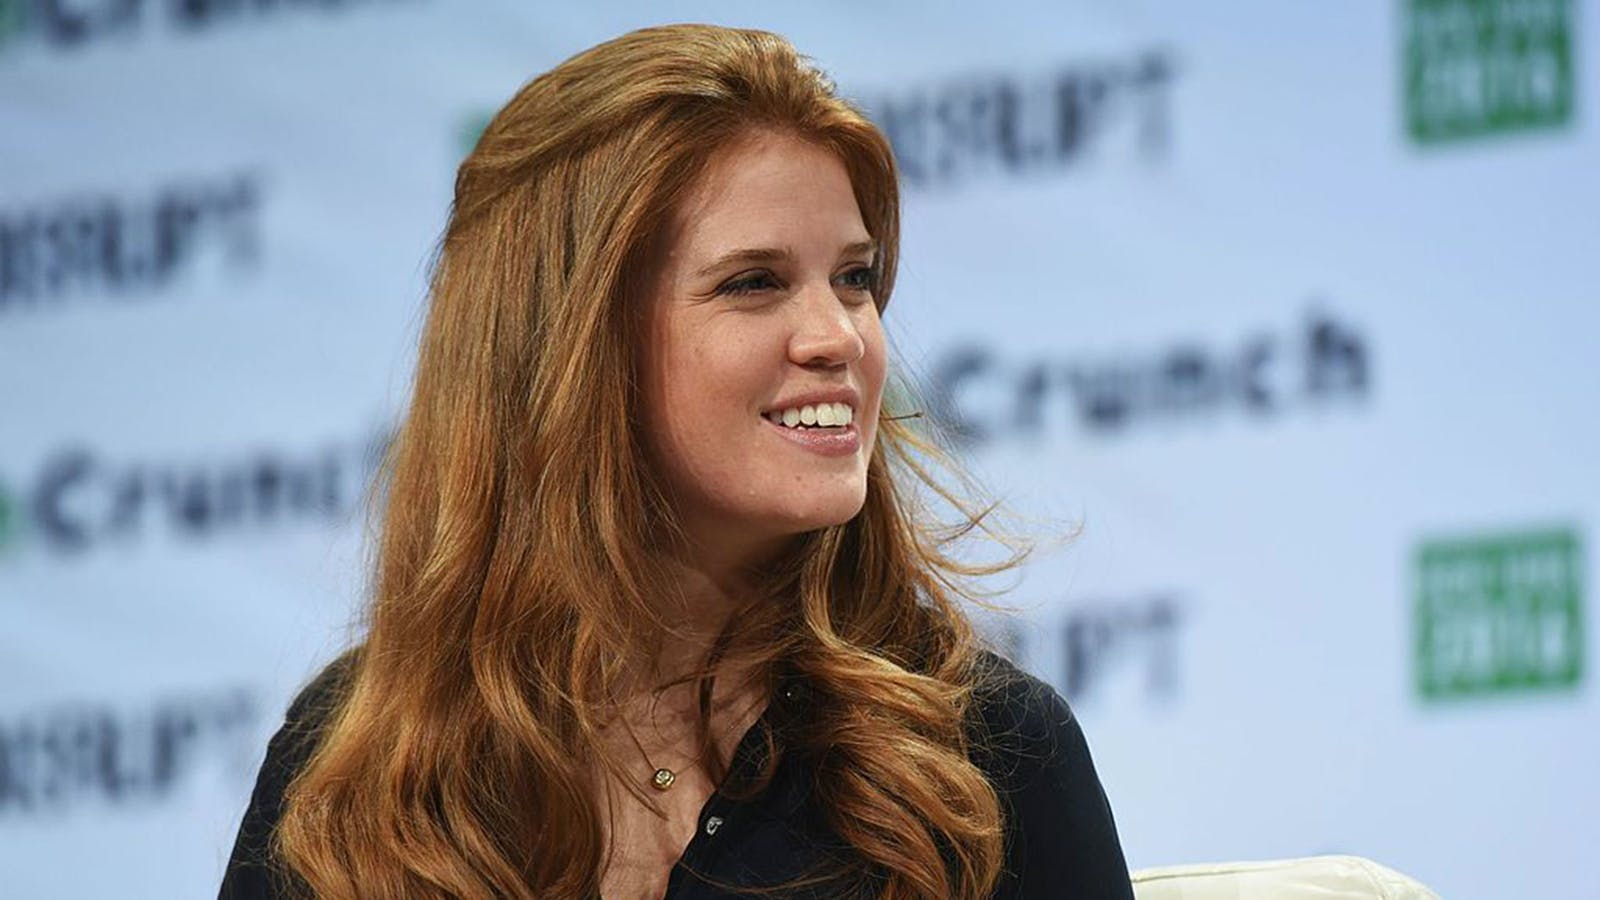 Human Ventures CEO Heather Hartnett. Photo by Noam Galai/Getty Images for TechCrunch